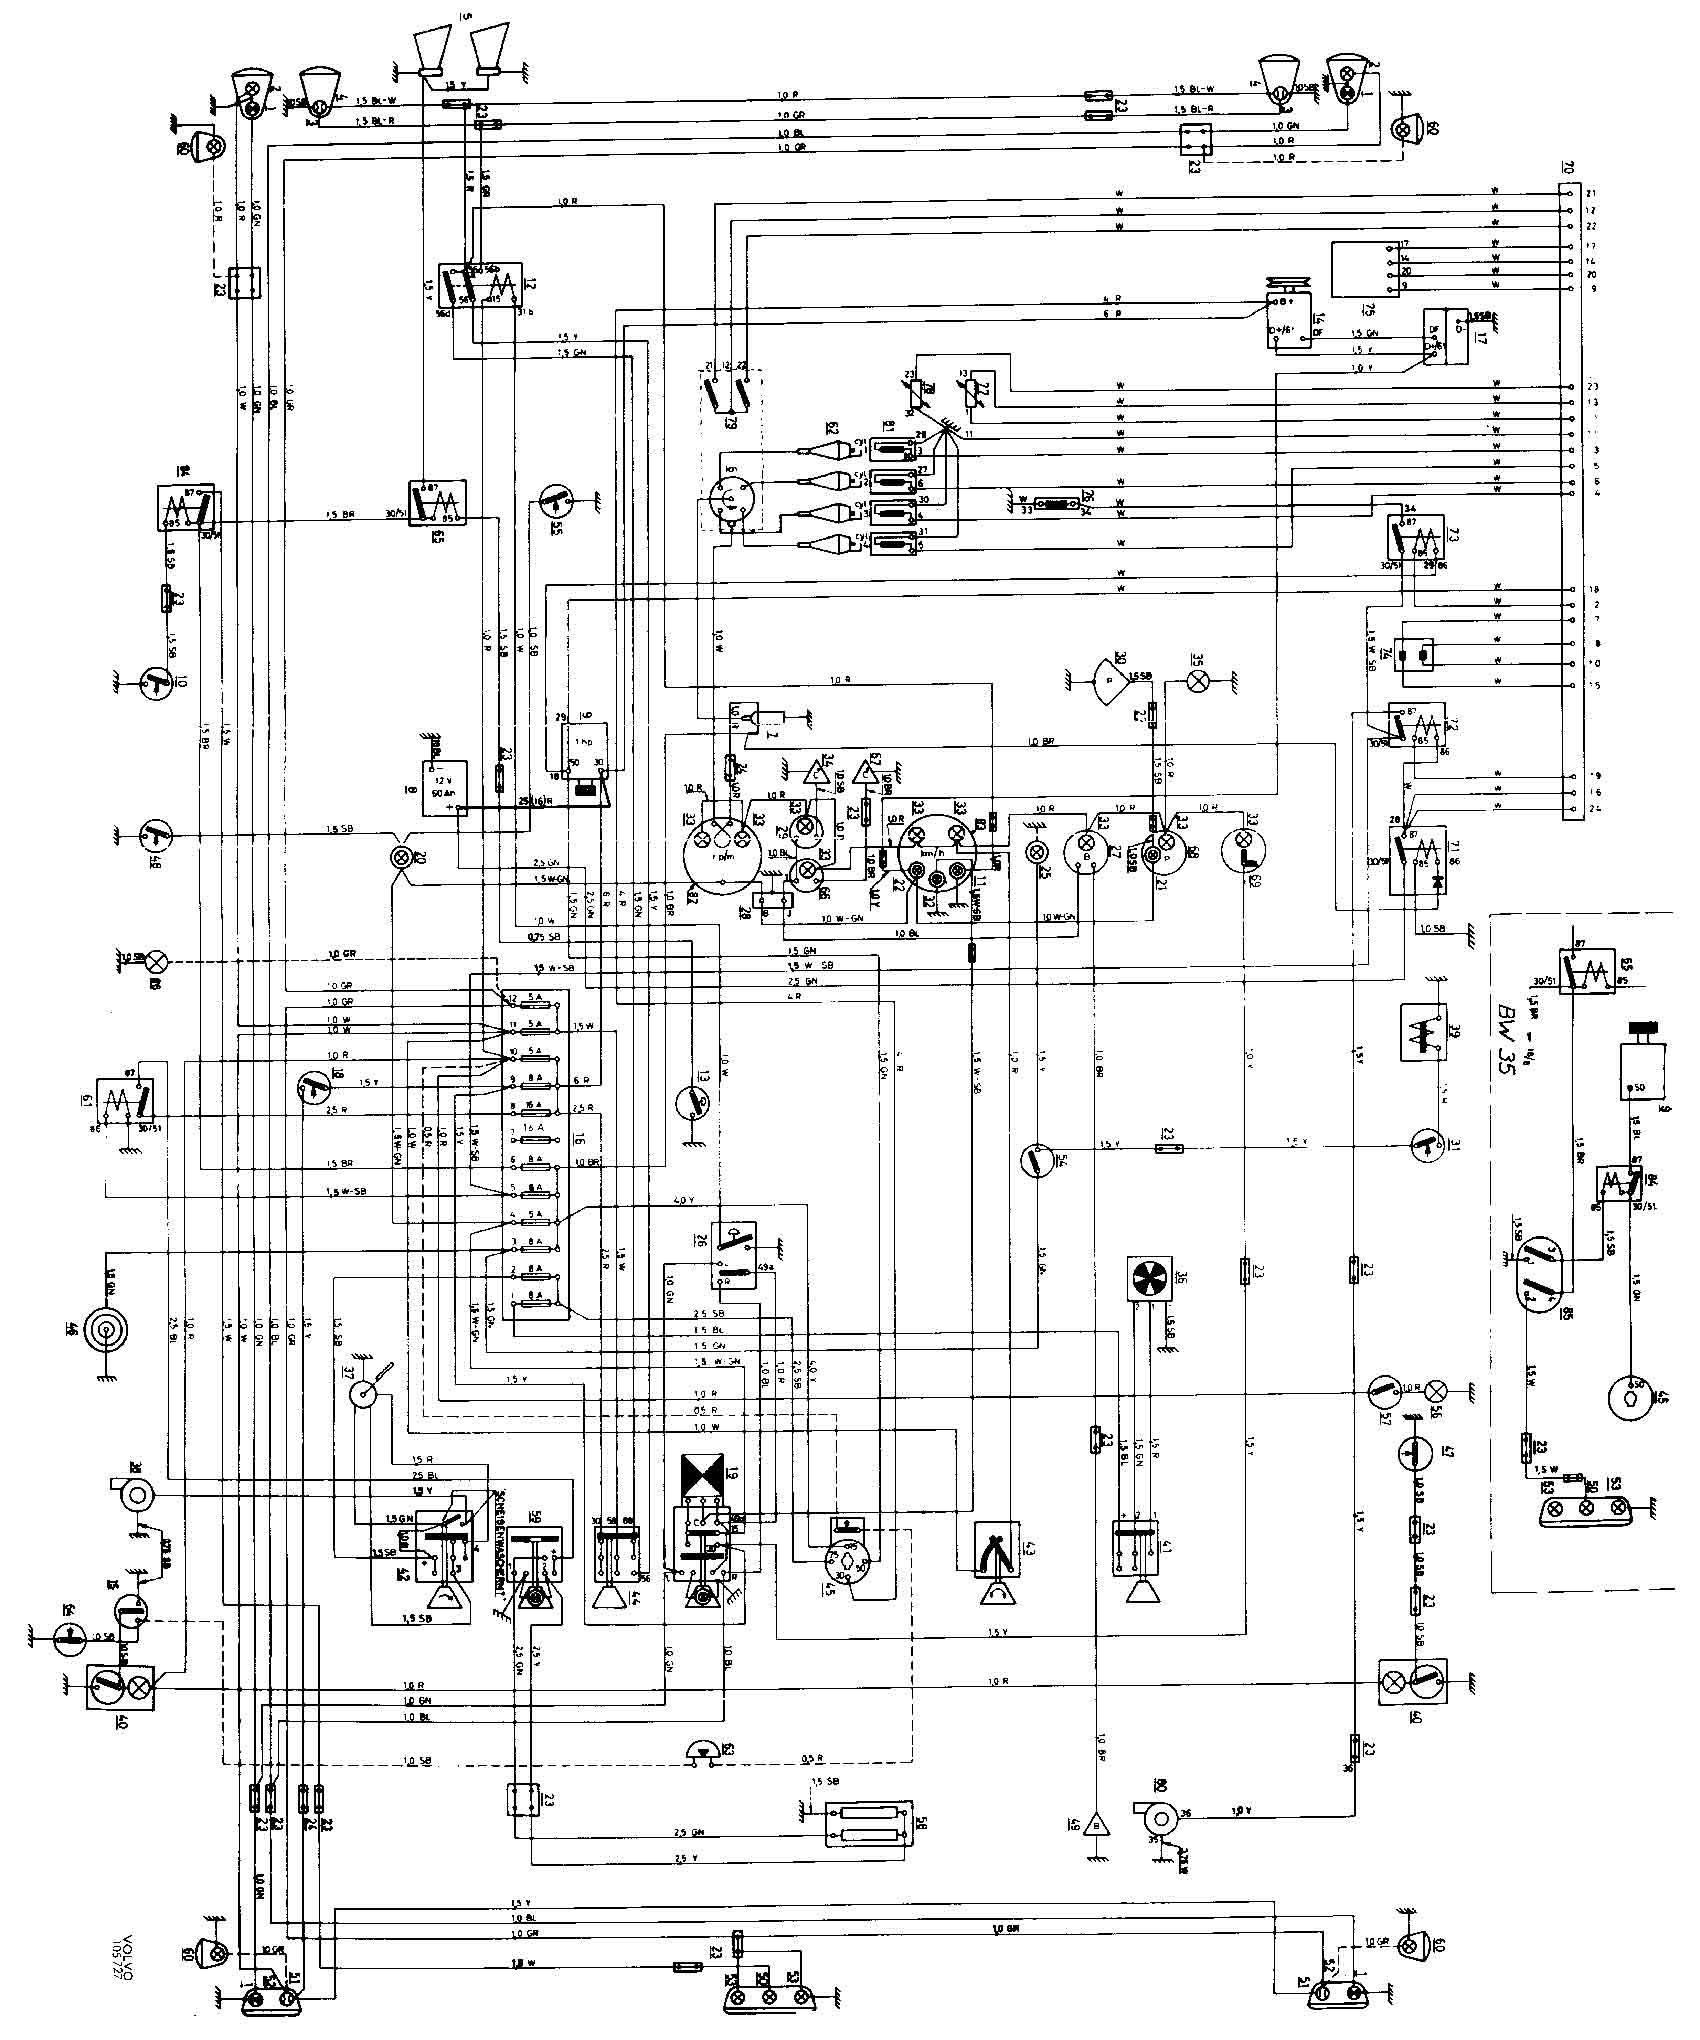 2007 Volvo Truck Wiring Diagrams Data Wiring Diagram Fast Greet Fast Greet Vivarelliauto It